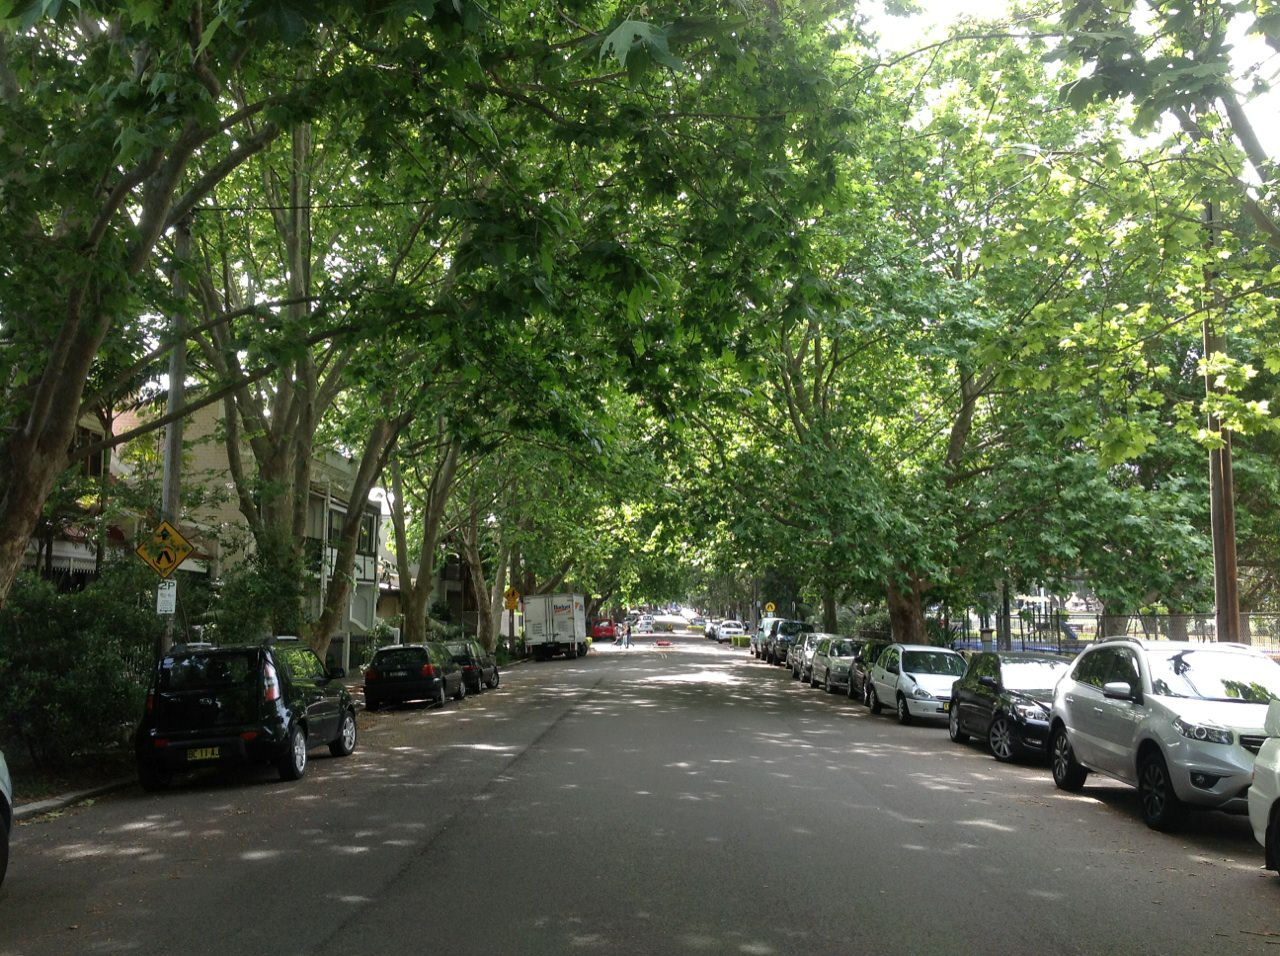 The London Plane Tree avenue along Buckland Street, Alexandria